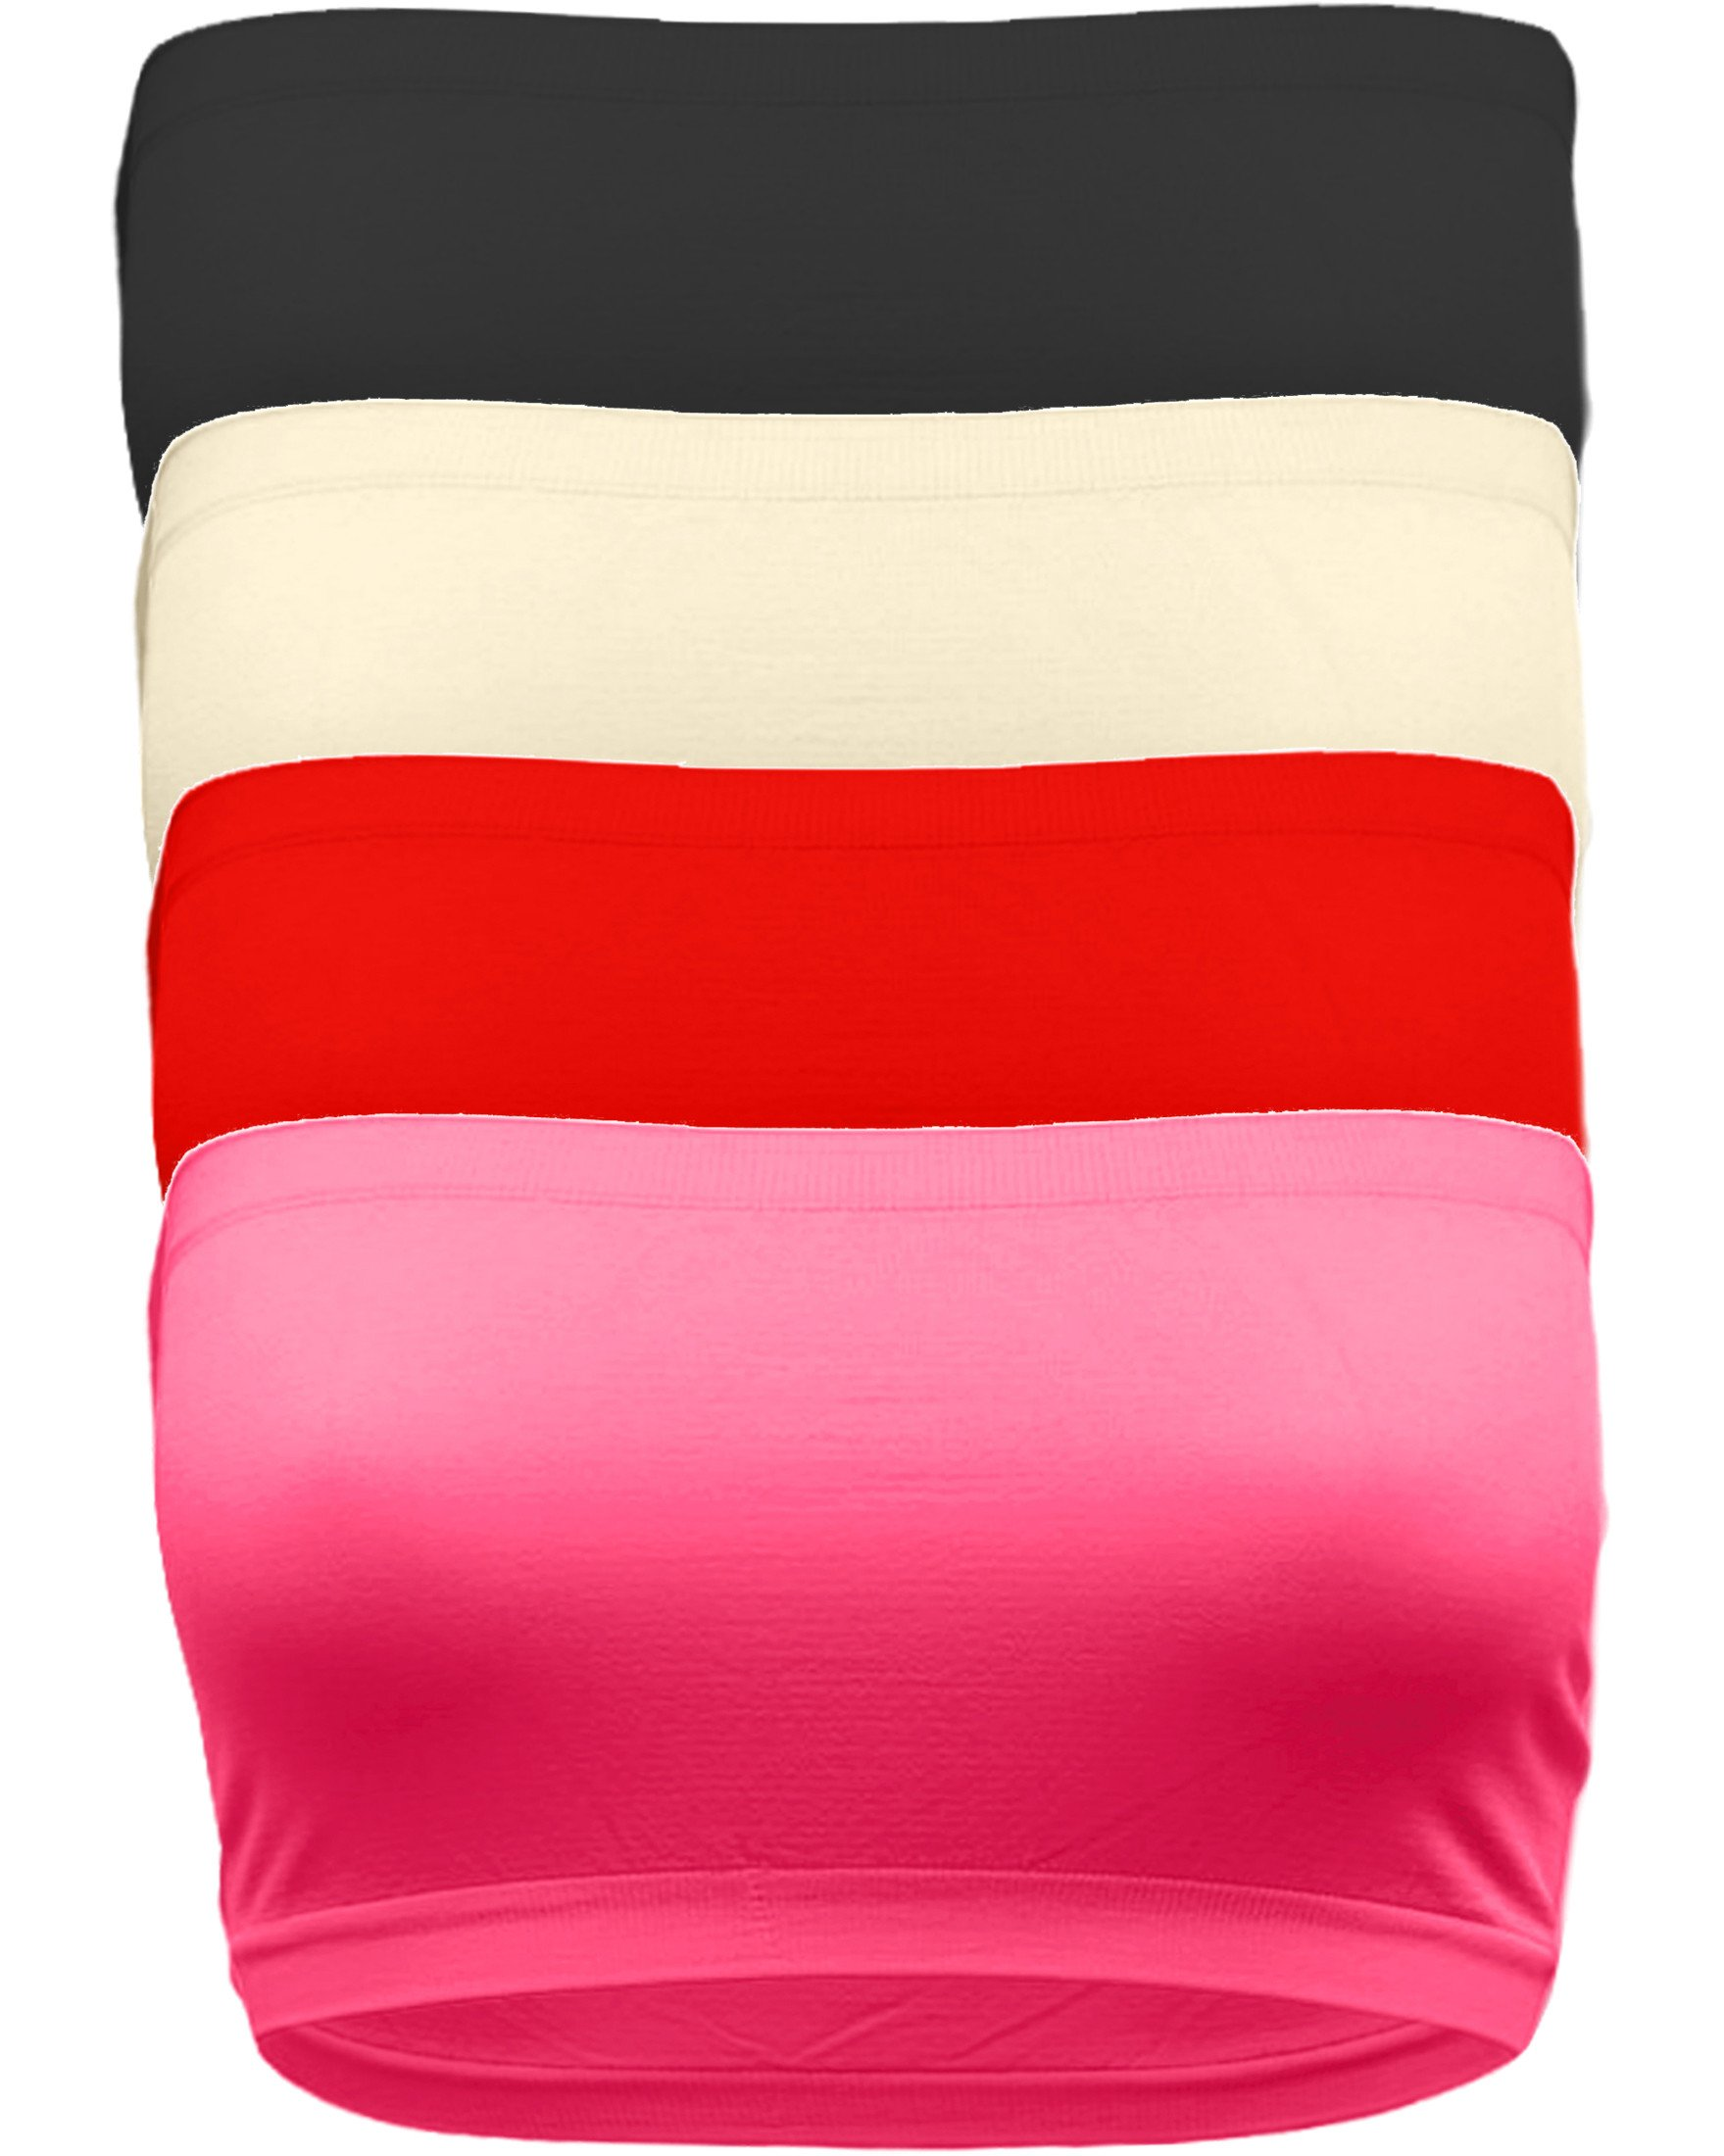 OLLIE ARNES Women's One Size Strapless Seamless Stretch Bandeau Tube Bra Top BK_TPE_RED_NPNK by OLLIE ARNES